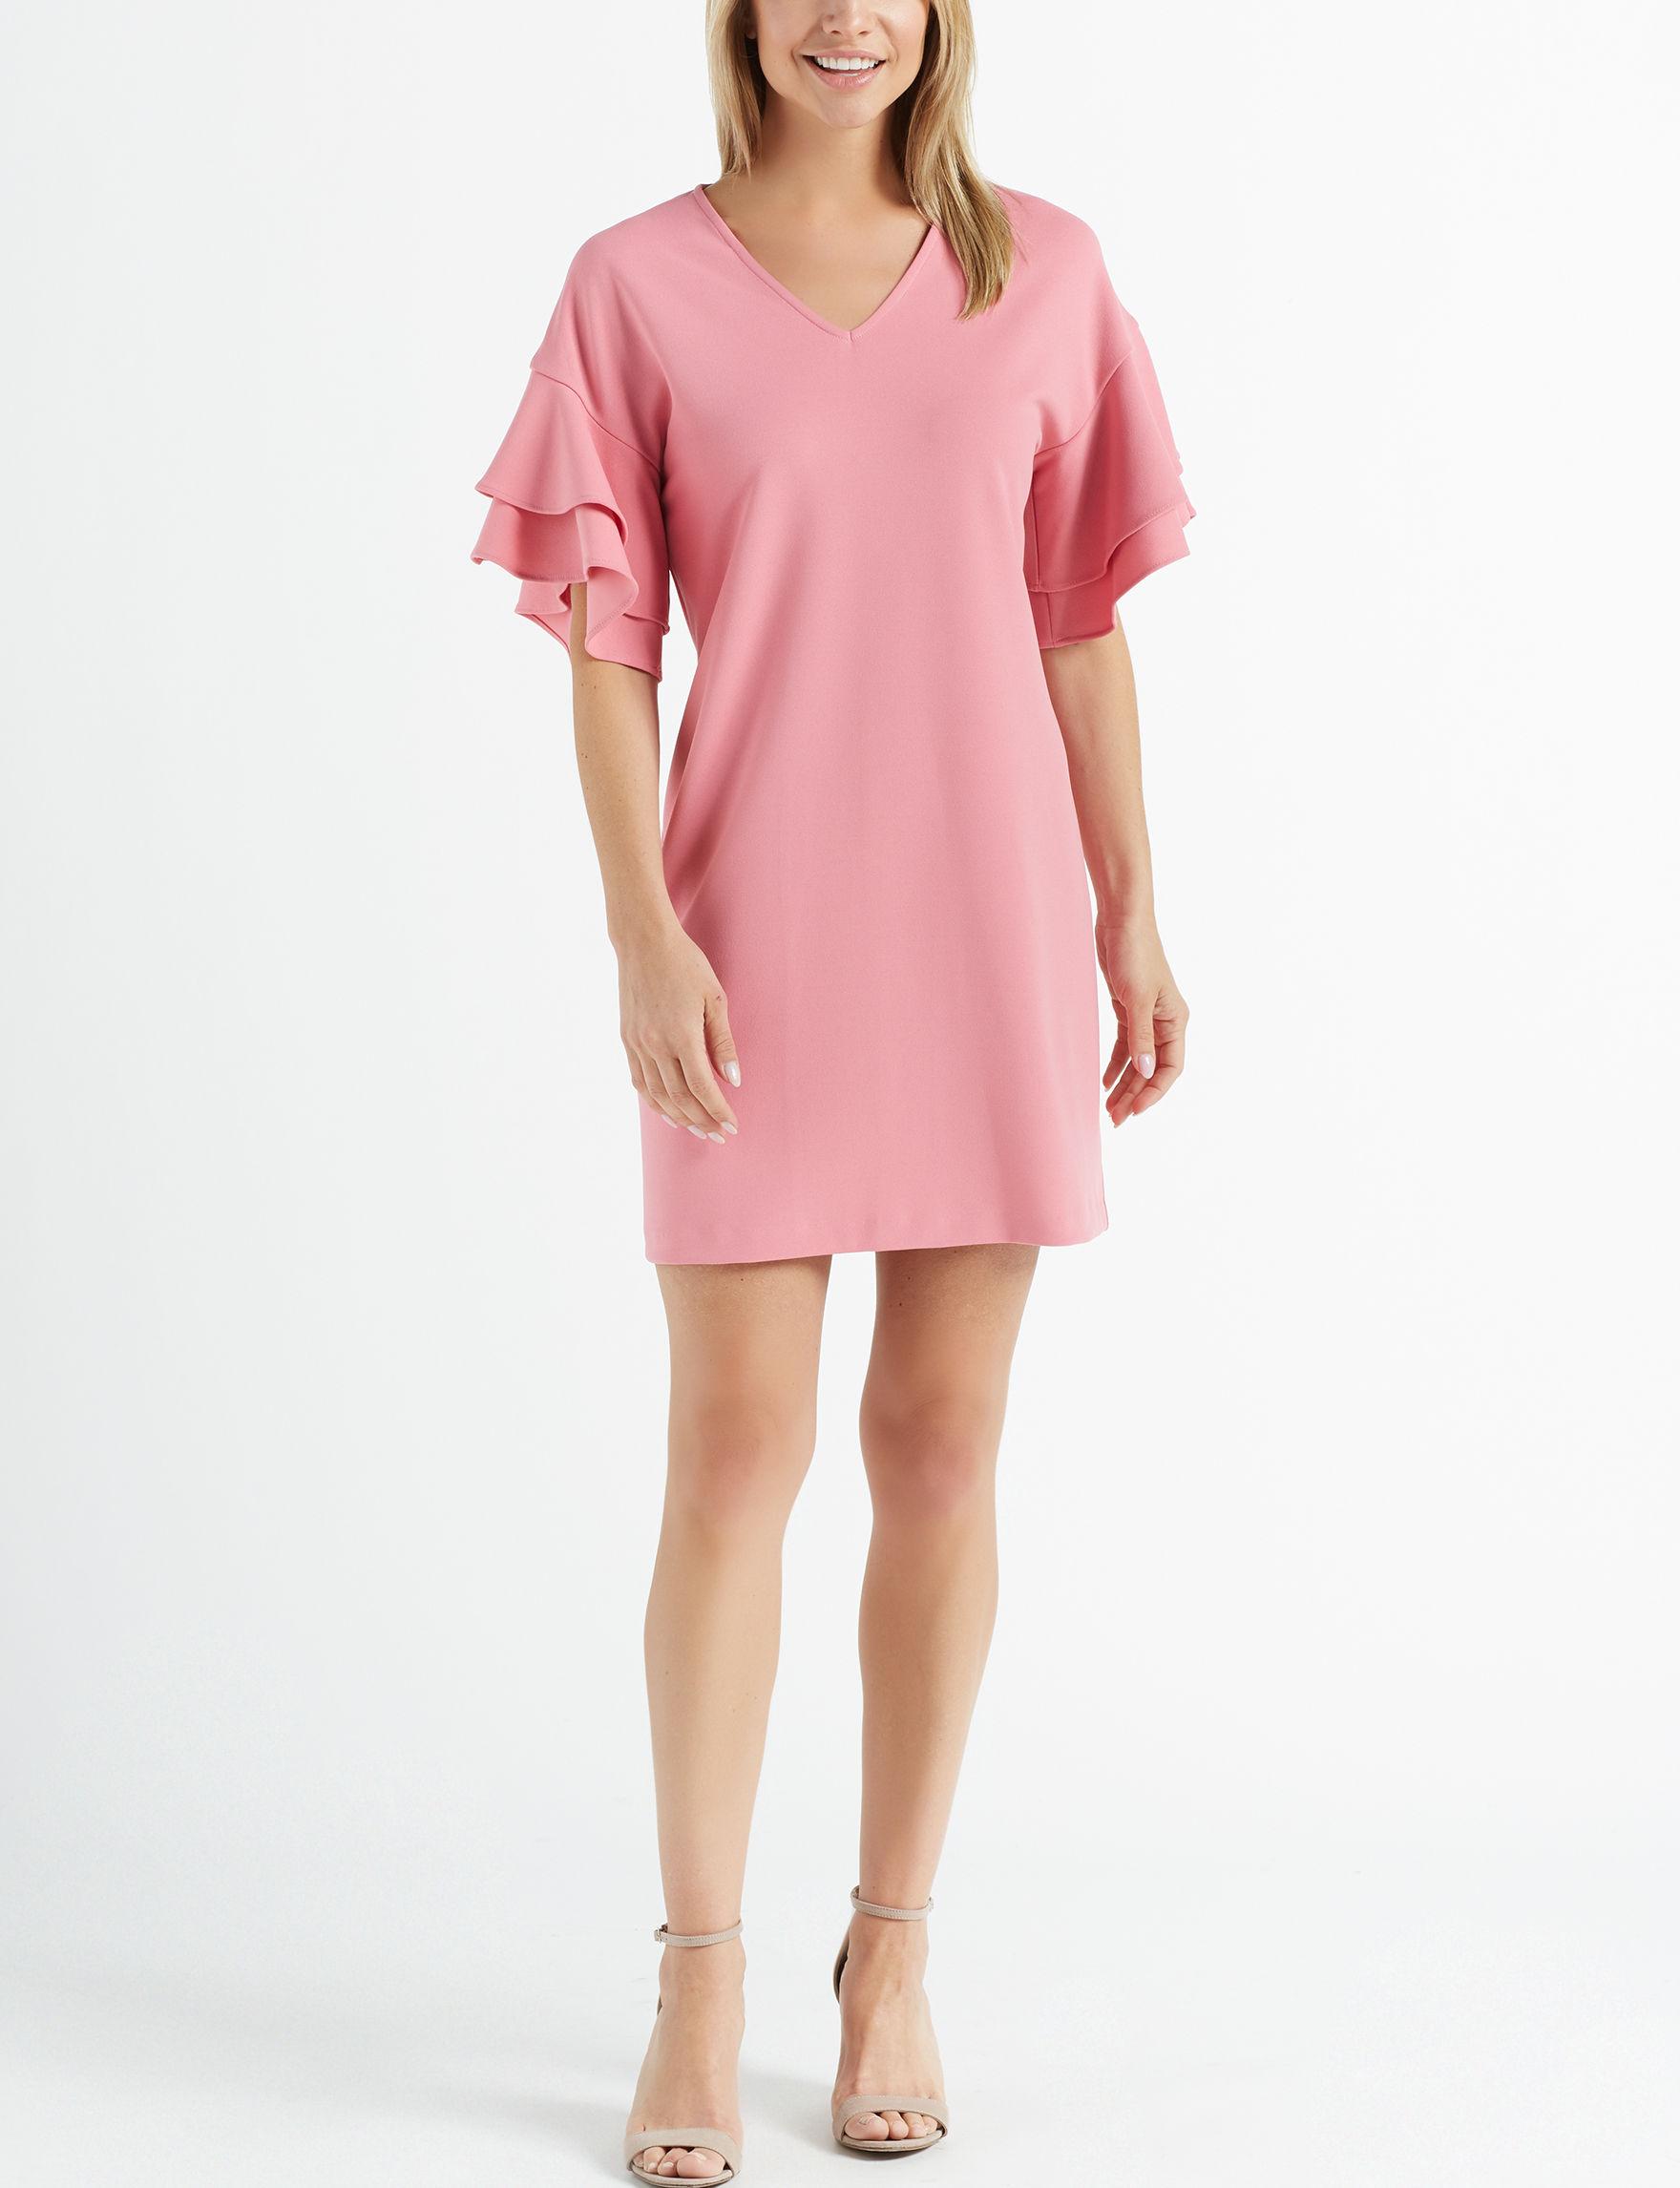 Nina Leonard Rose Everyday & Casual Shift Dresses